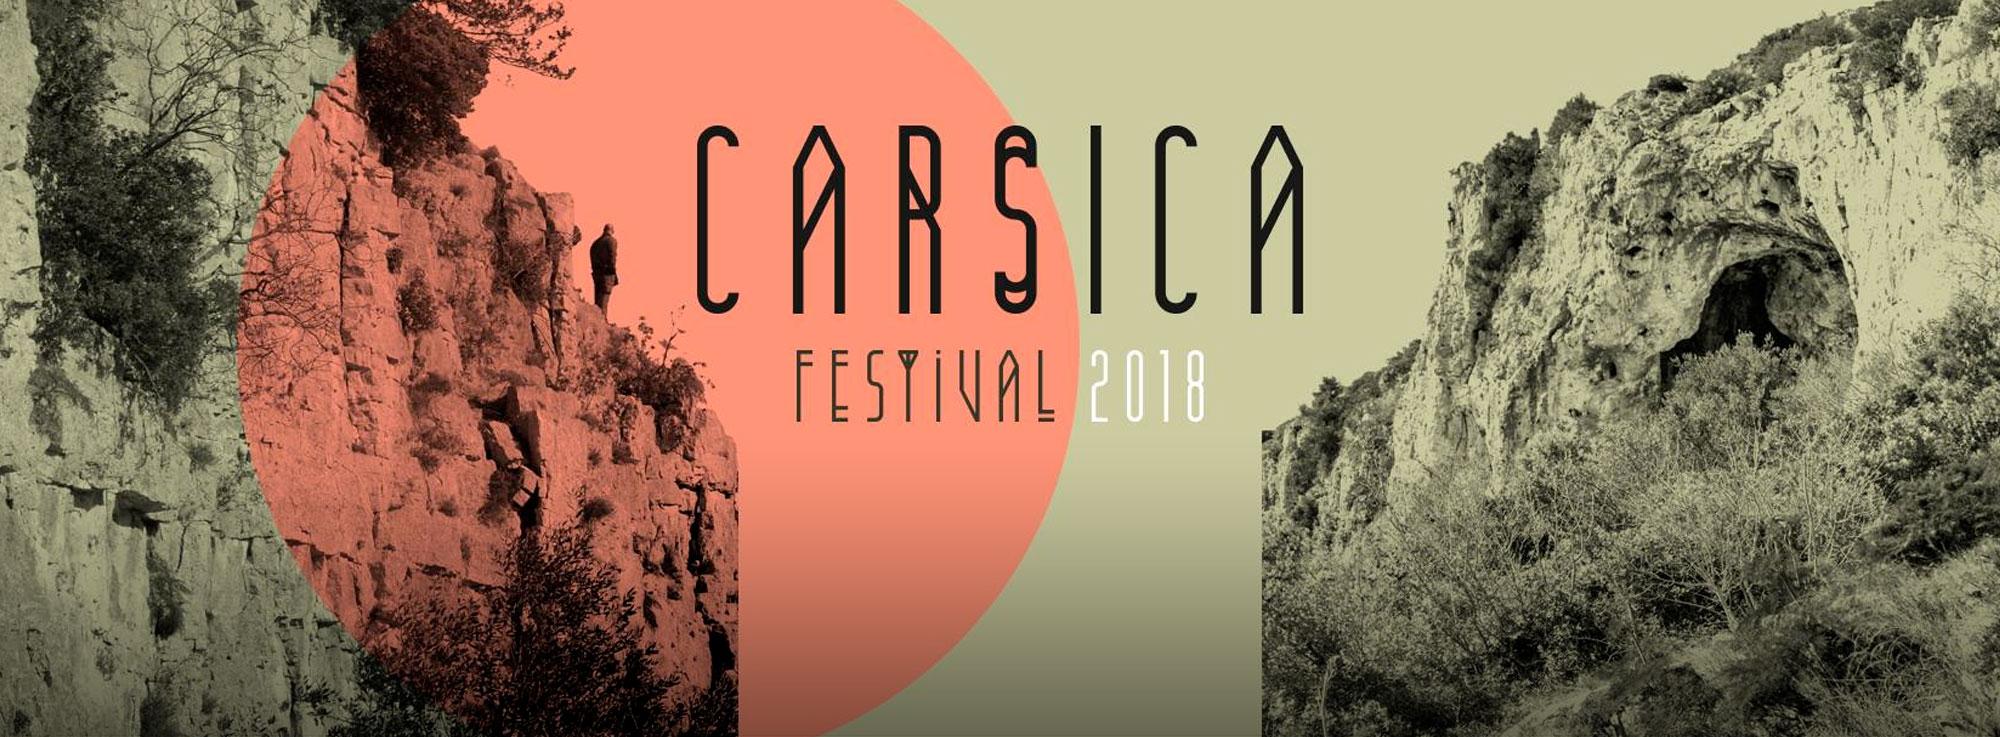 Laterza, Grottaglie, Ginosa, Castellaneta, Mottola: Carsica Festival